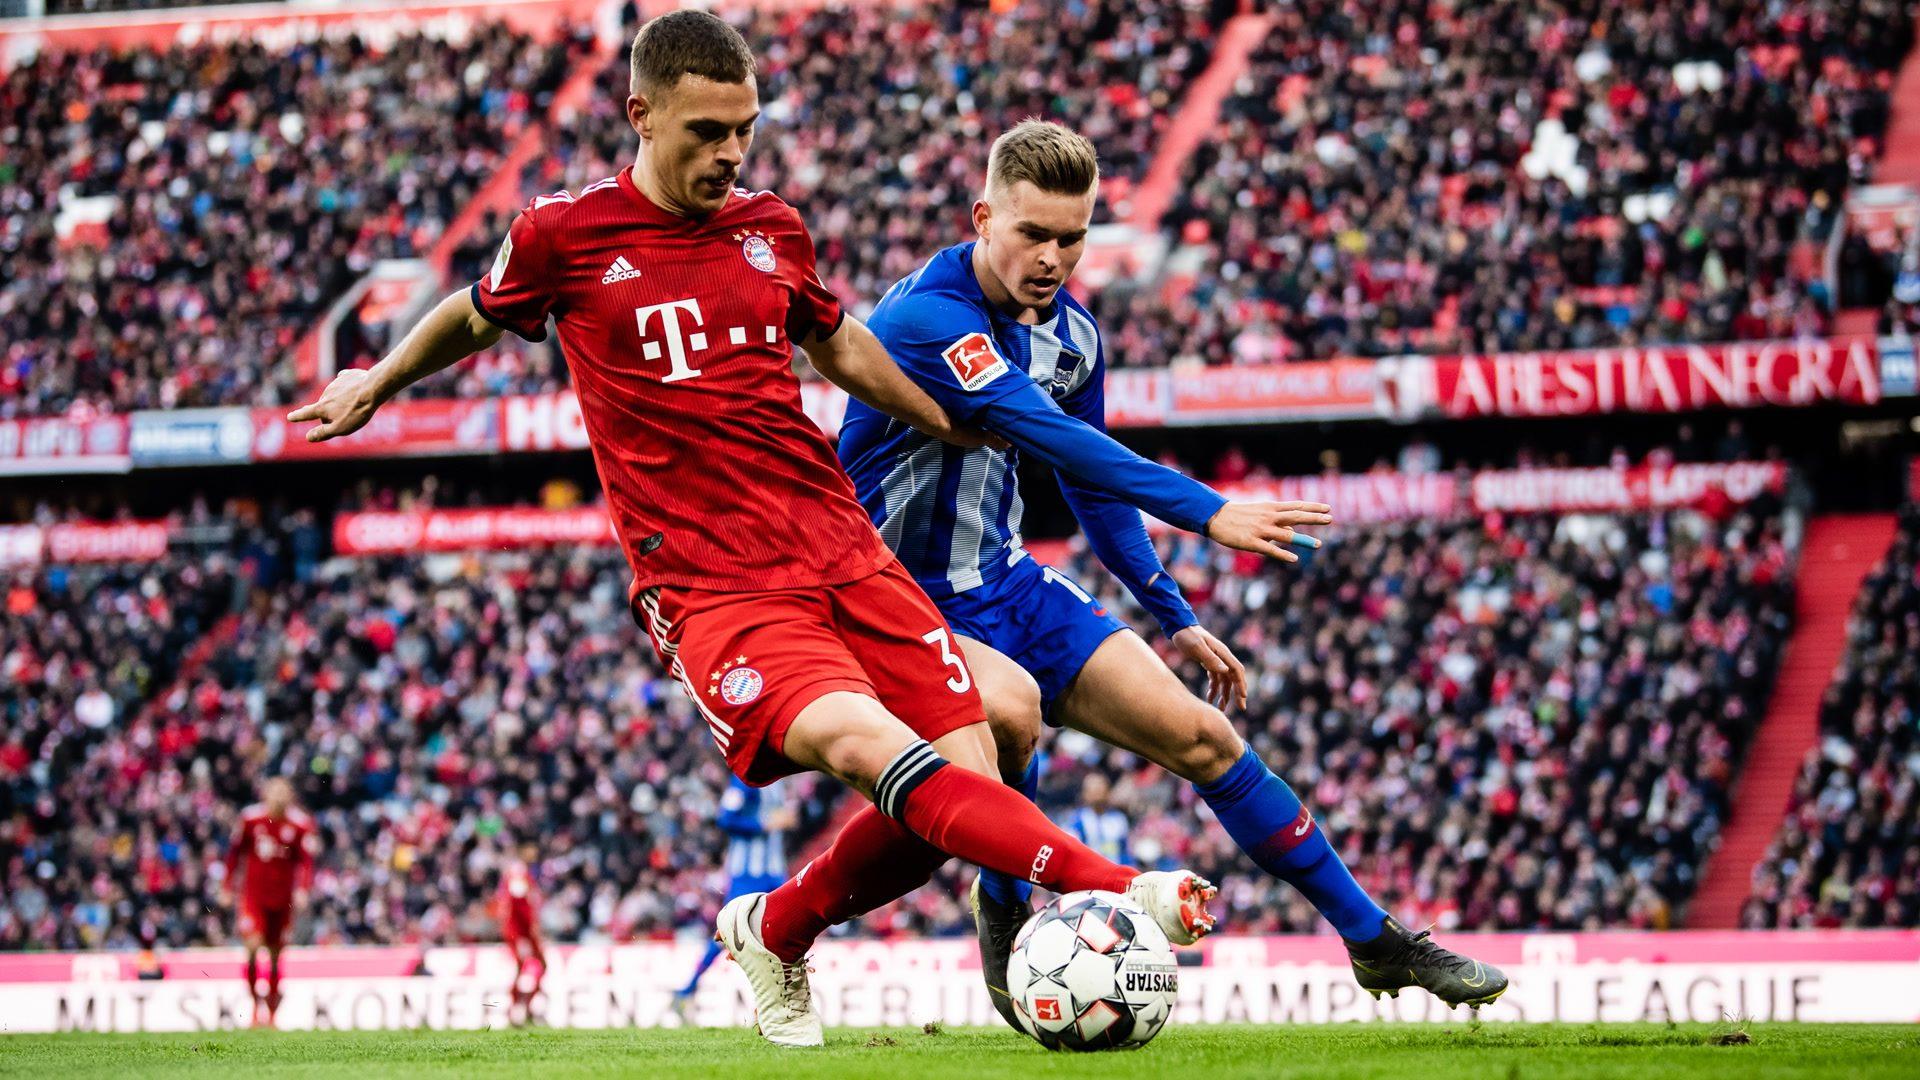 FCB gegen BSC: Eröffnungsspiel der Saison 2019/20